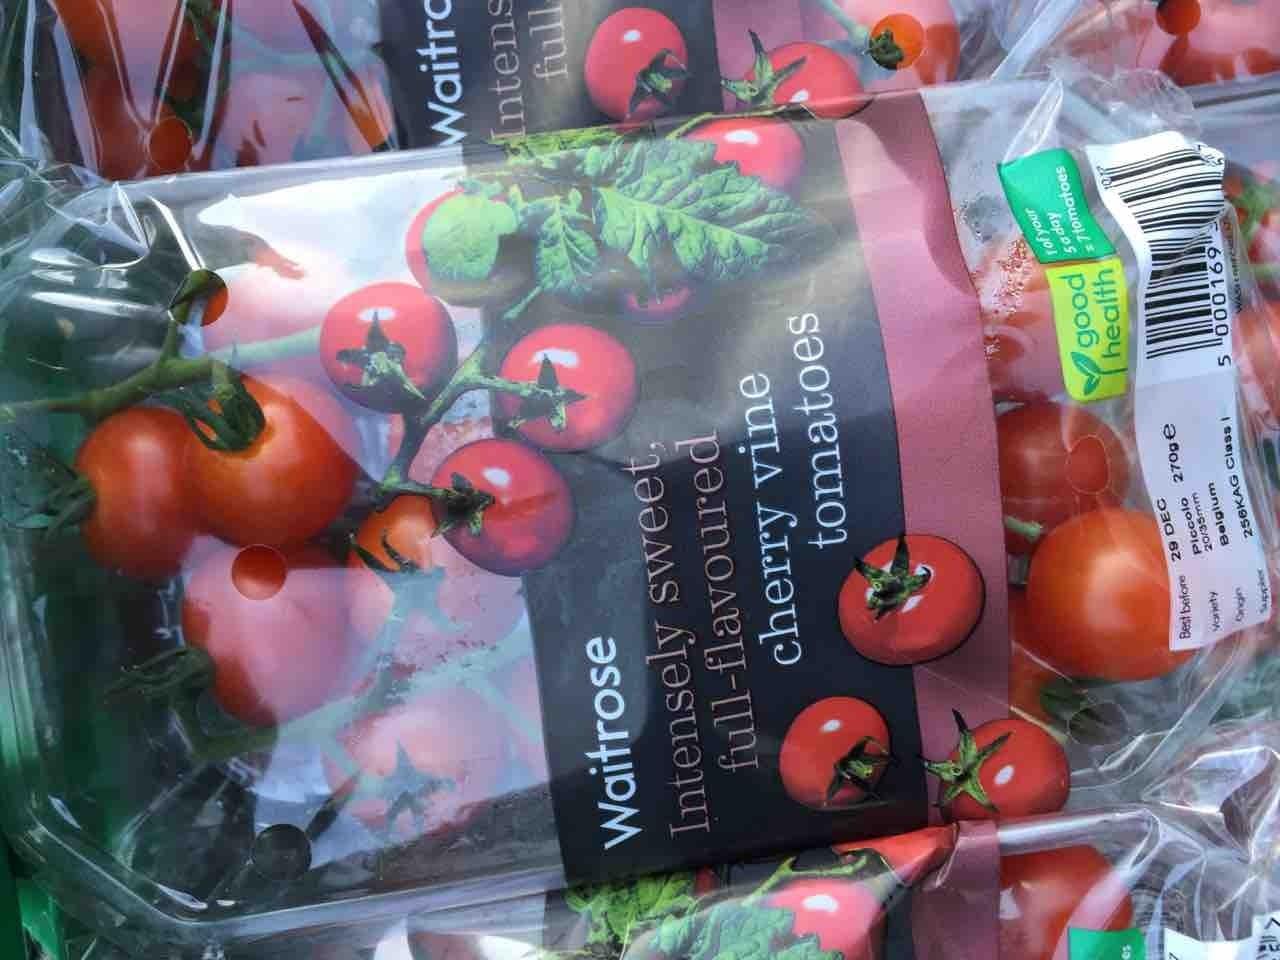 14x Cherry vine tomatoes